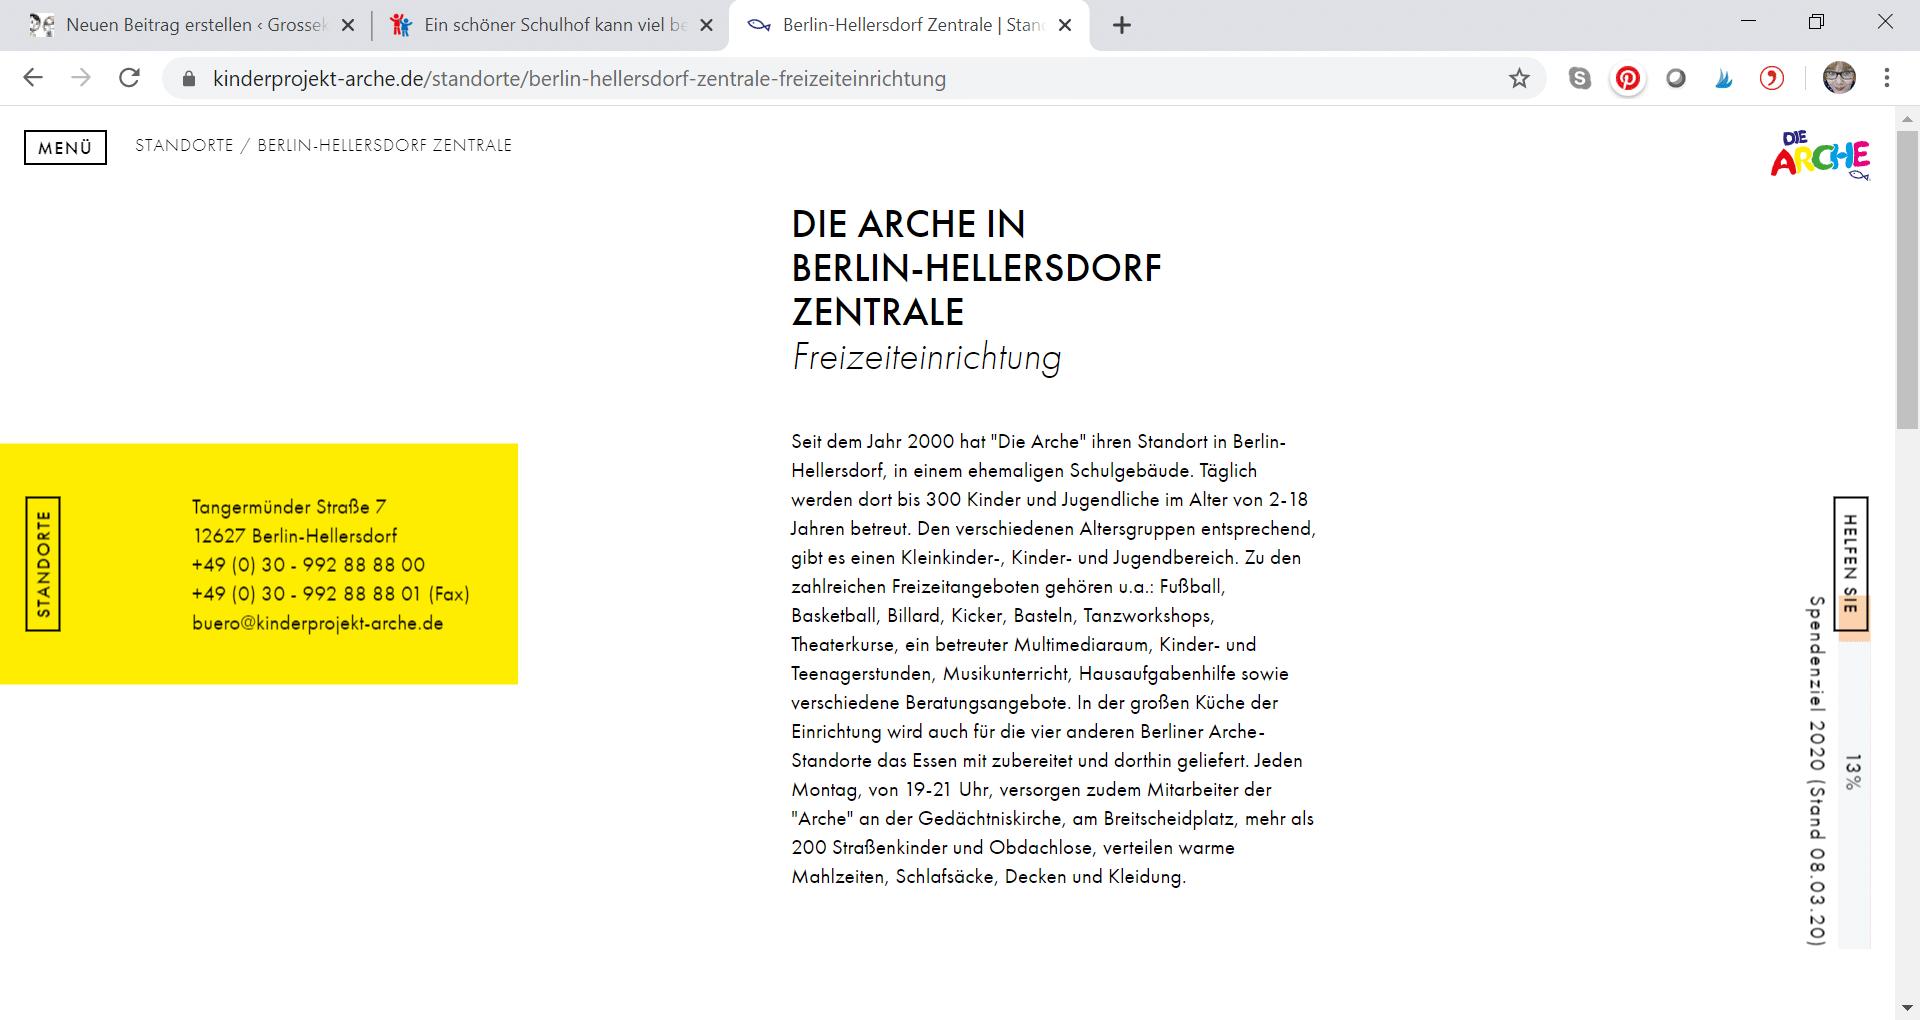 Die Arche_ Zentrale Berlin